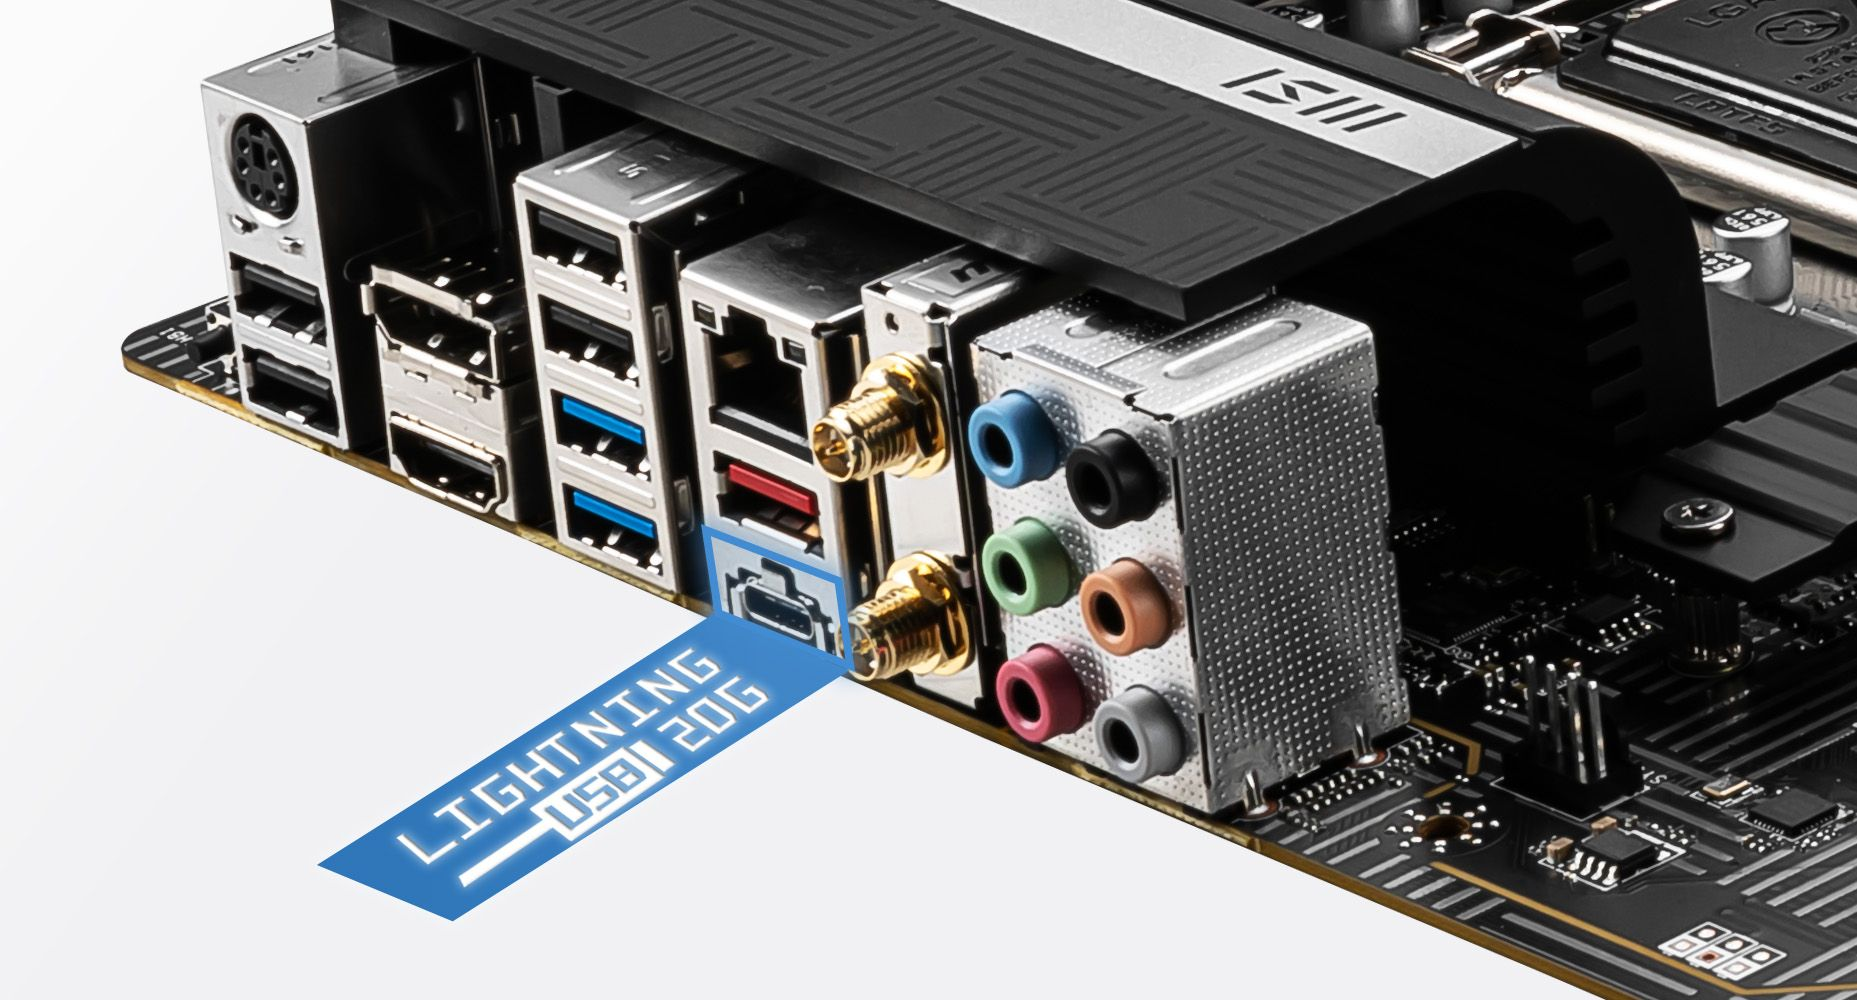 MSI Z590 PRO WIFI FASTER LIGHTNING USB 20G